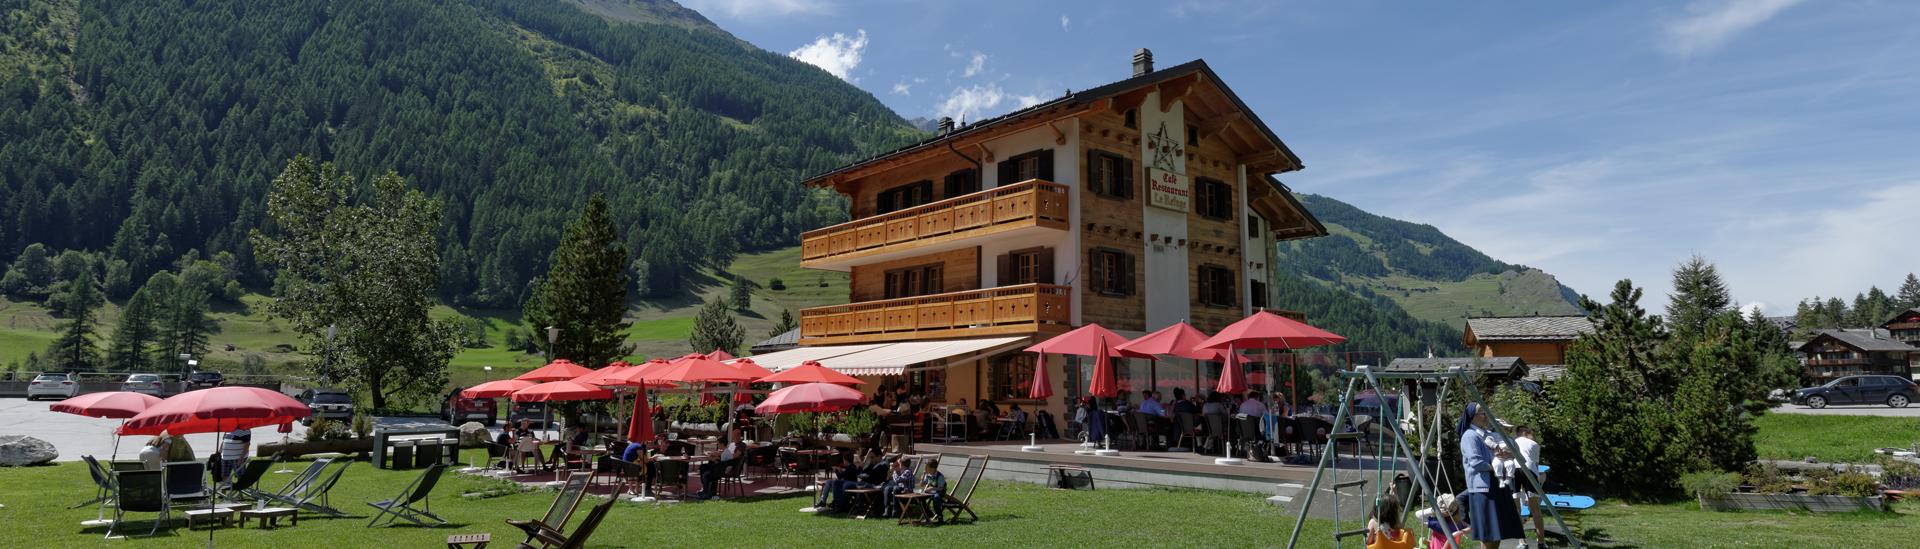 Café-Restaurant Le Refuge